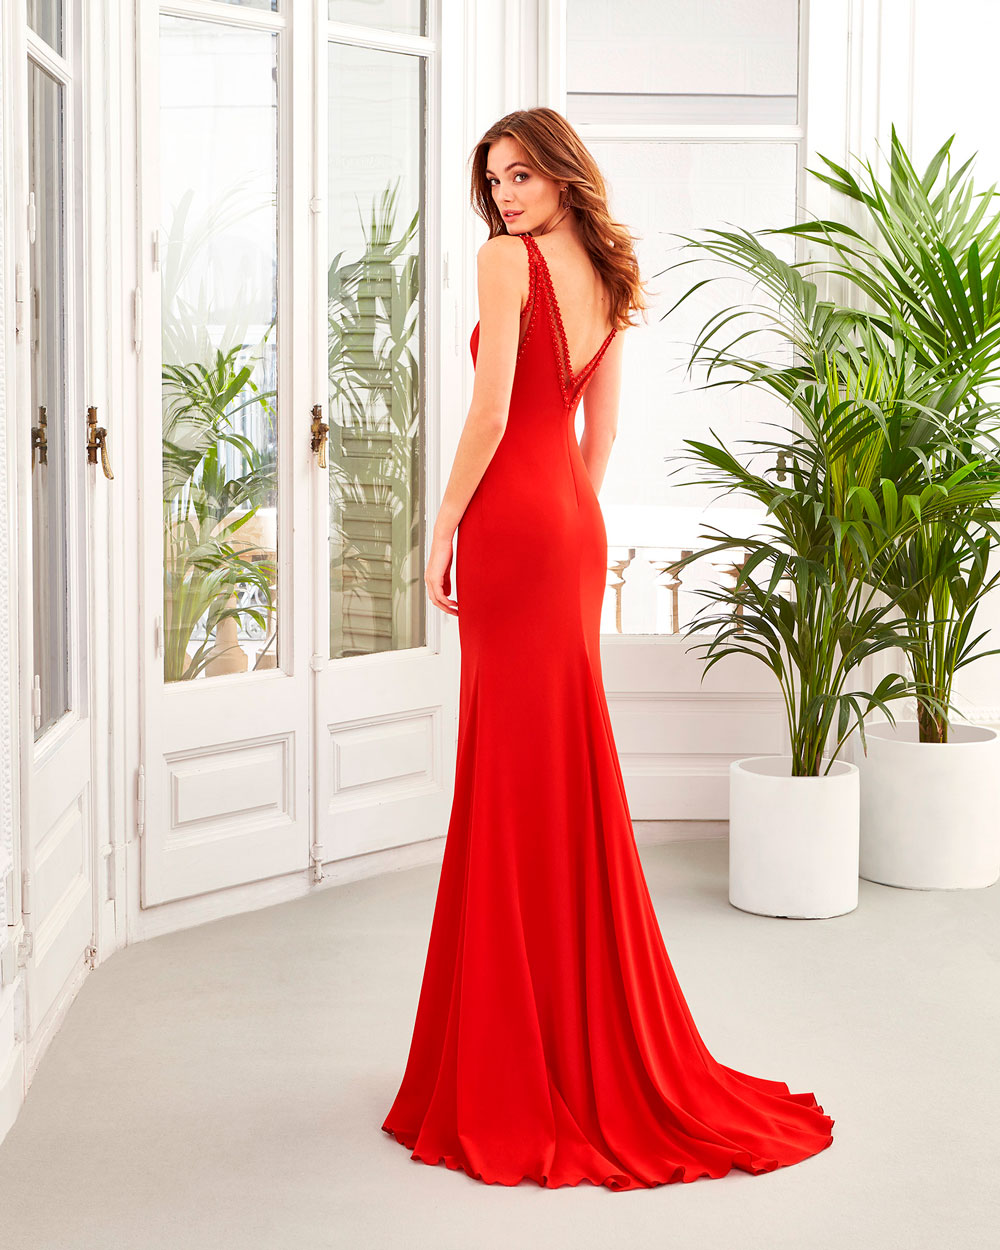 vestido de fiesta 2020 4U121 AIRE BARCELONA FIESTA 2